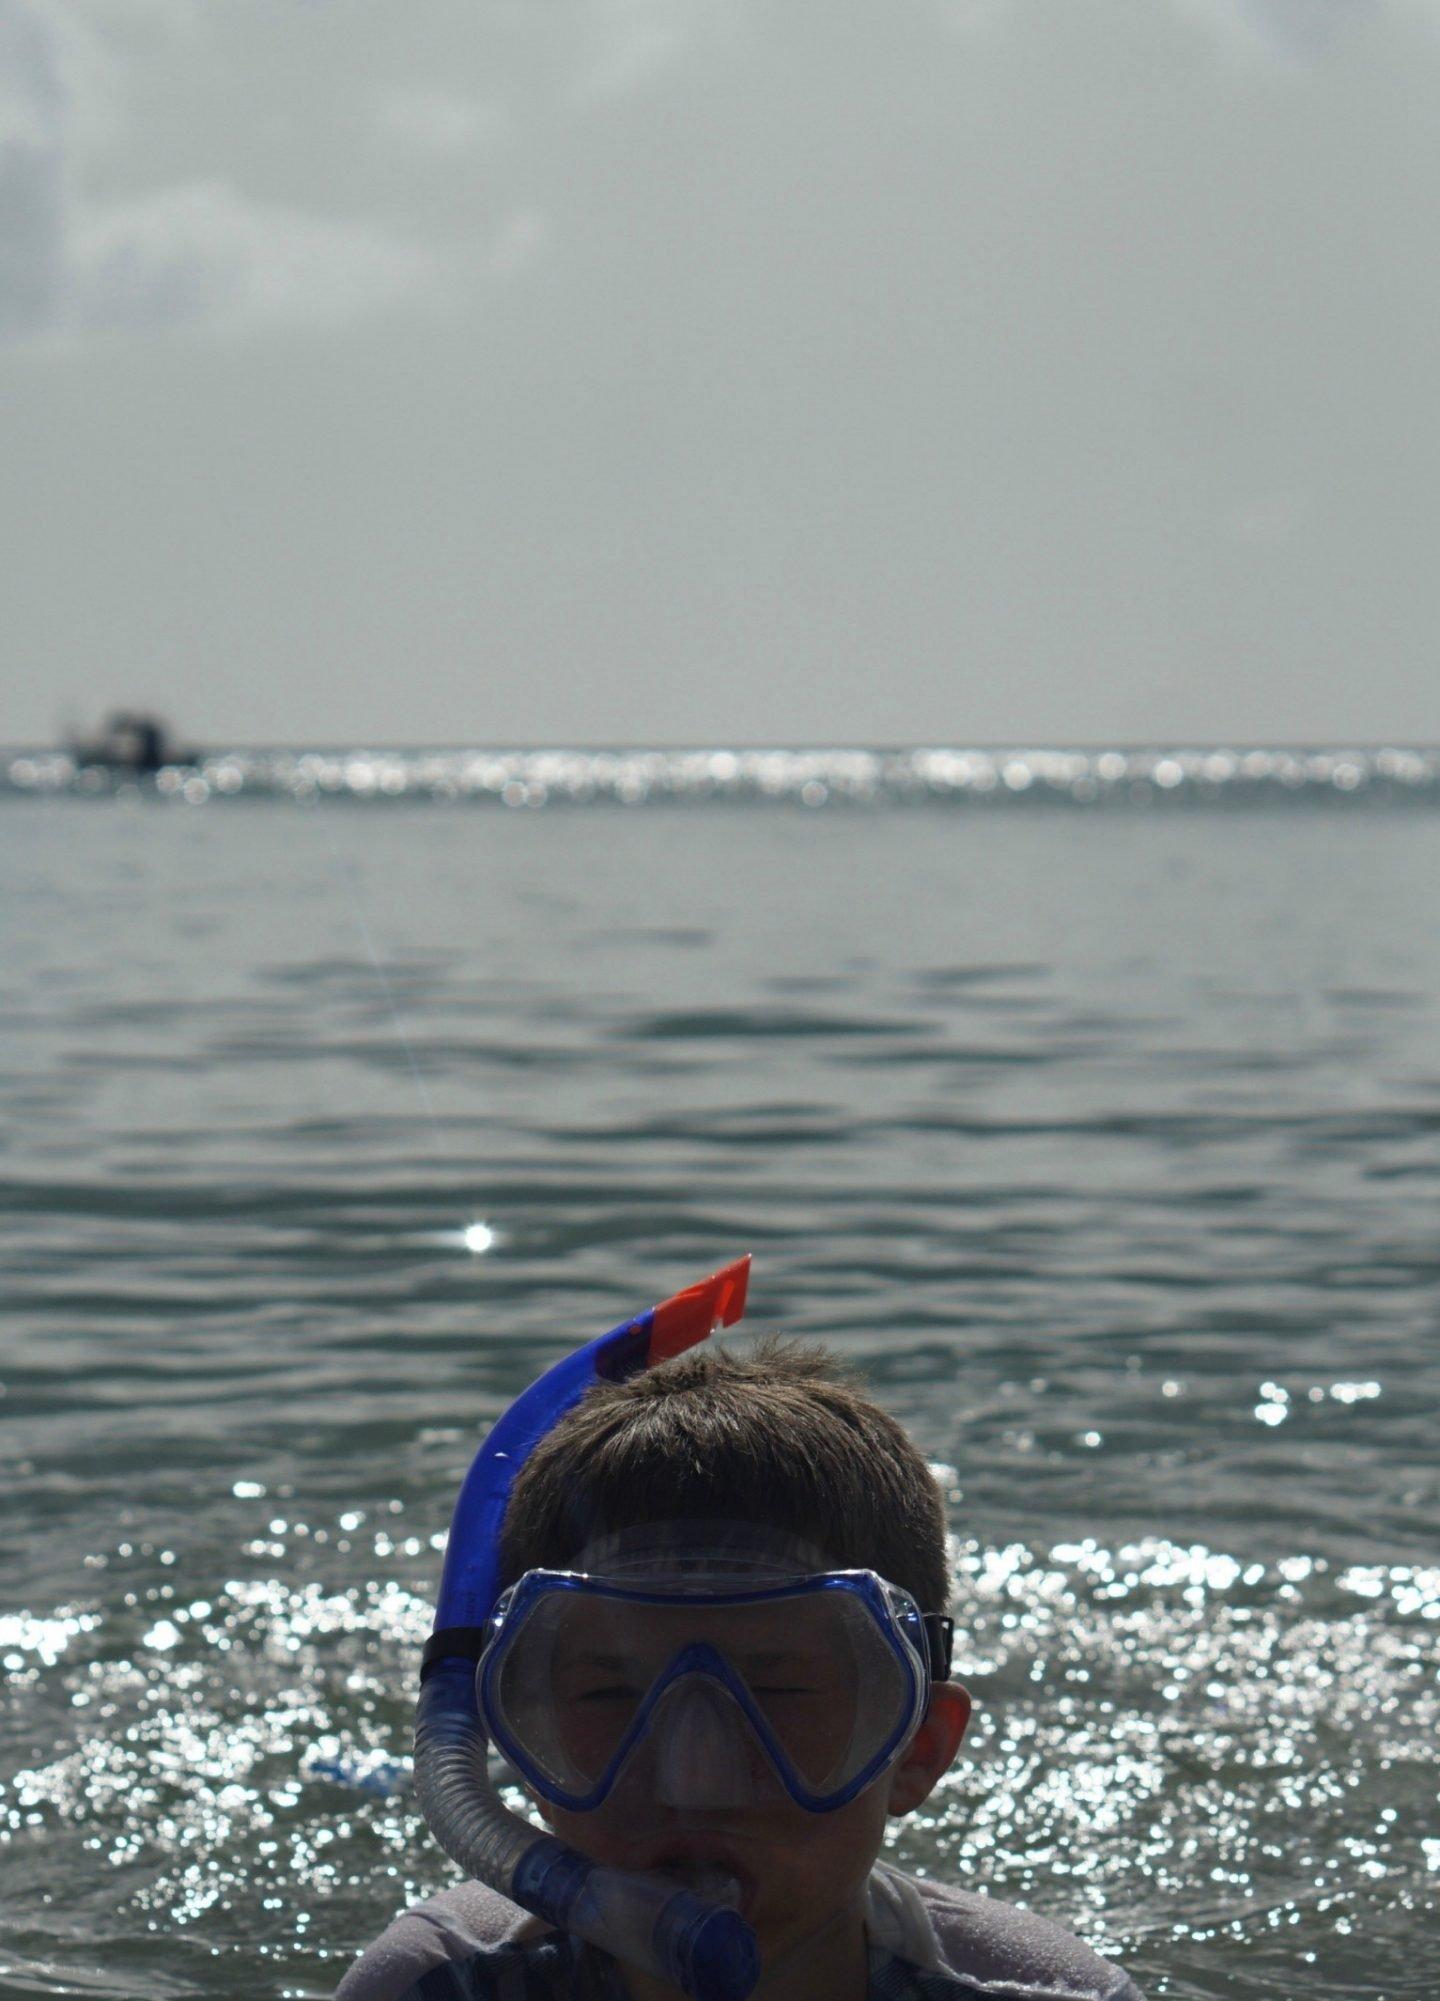 Zoggs Snorkel and mask set www.extraordinarychaos.com